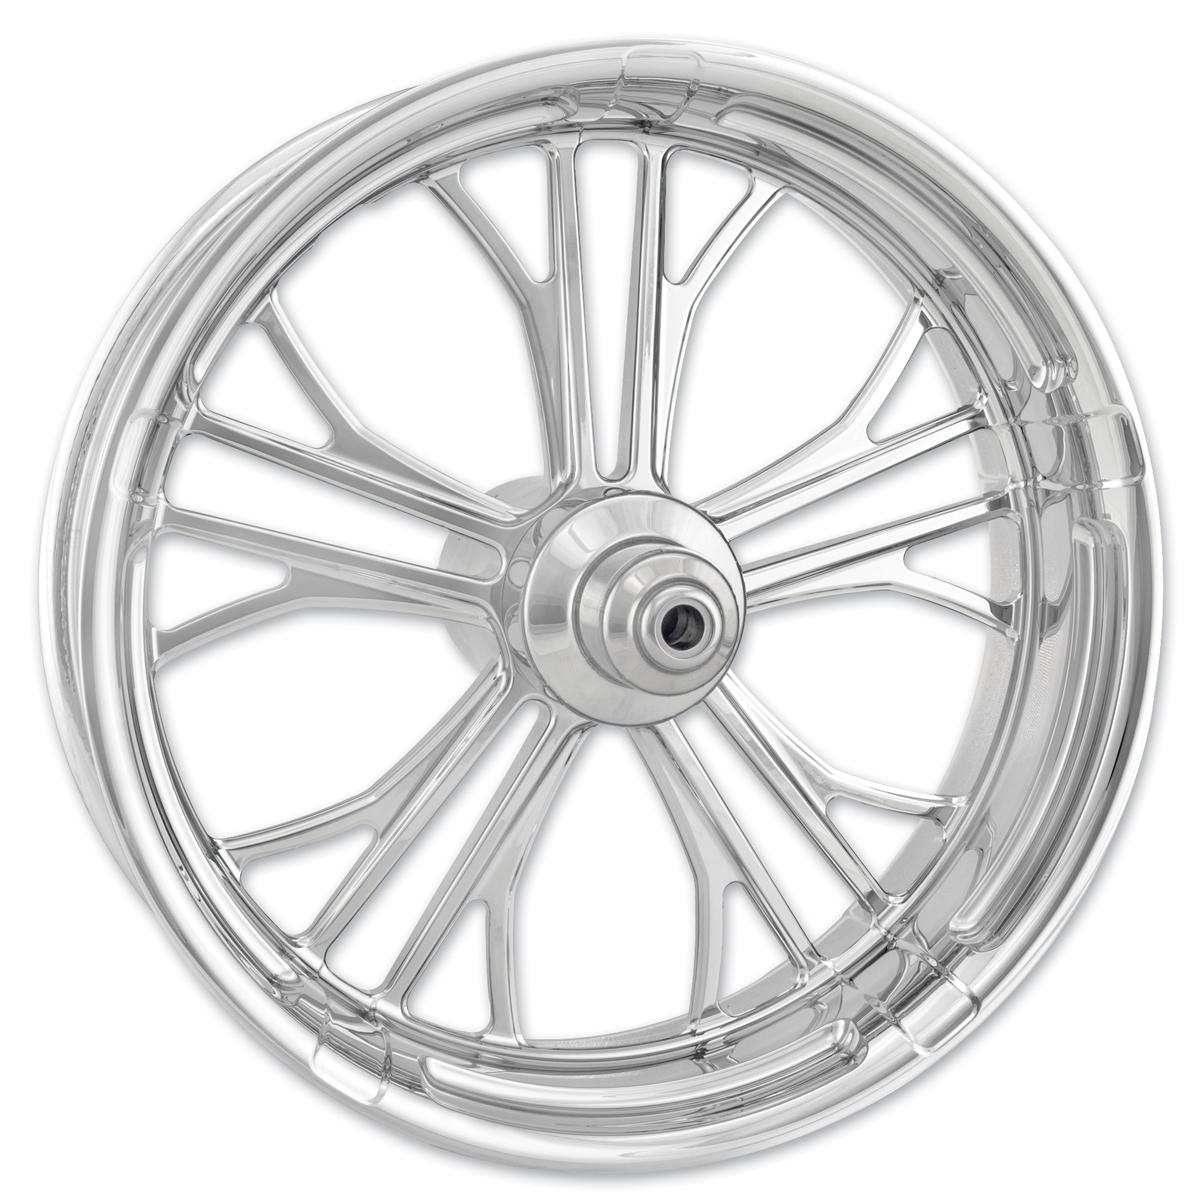 Performance Machine Dixon Chrome Rear Wheel 17x6 ABS